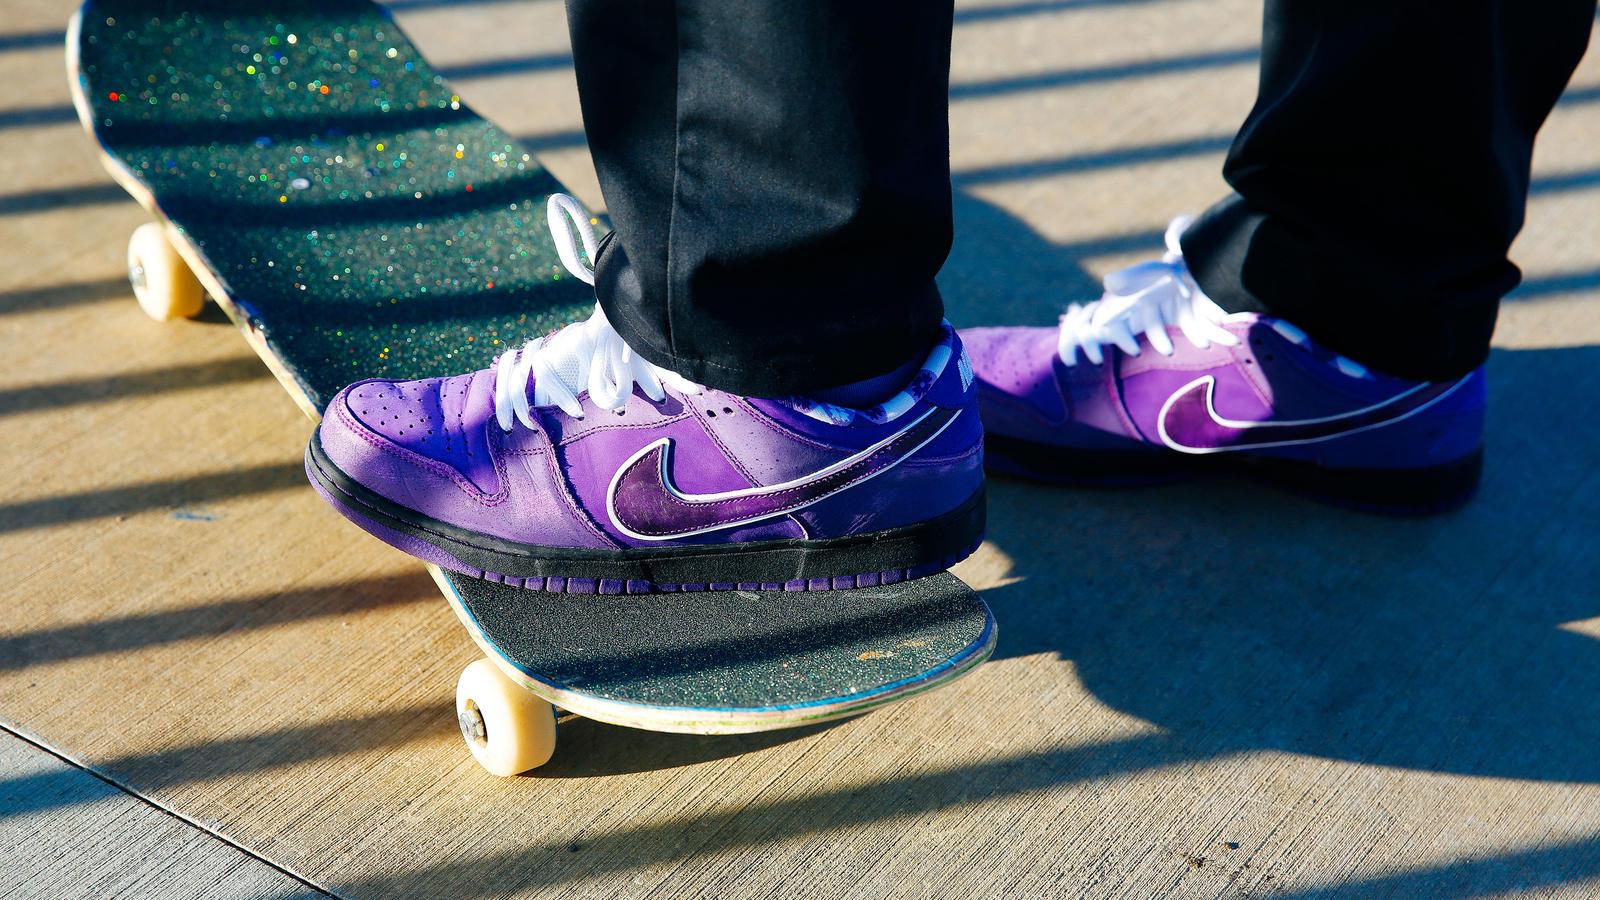 Concepts x Nike SB Dunk Purple Lobster